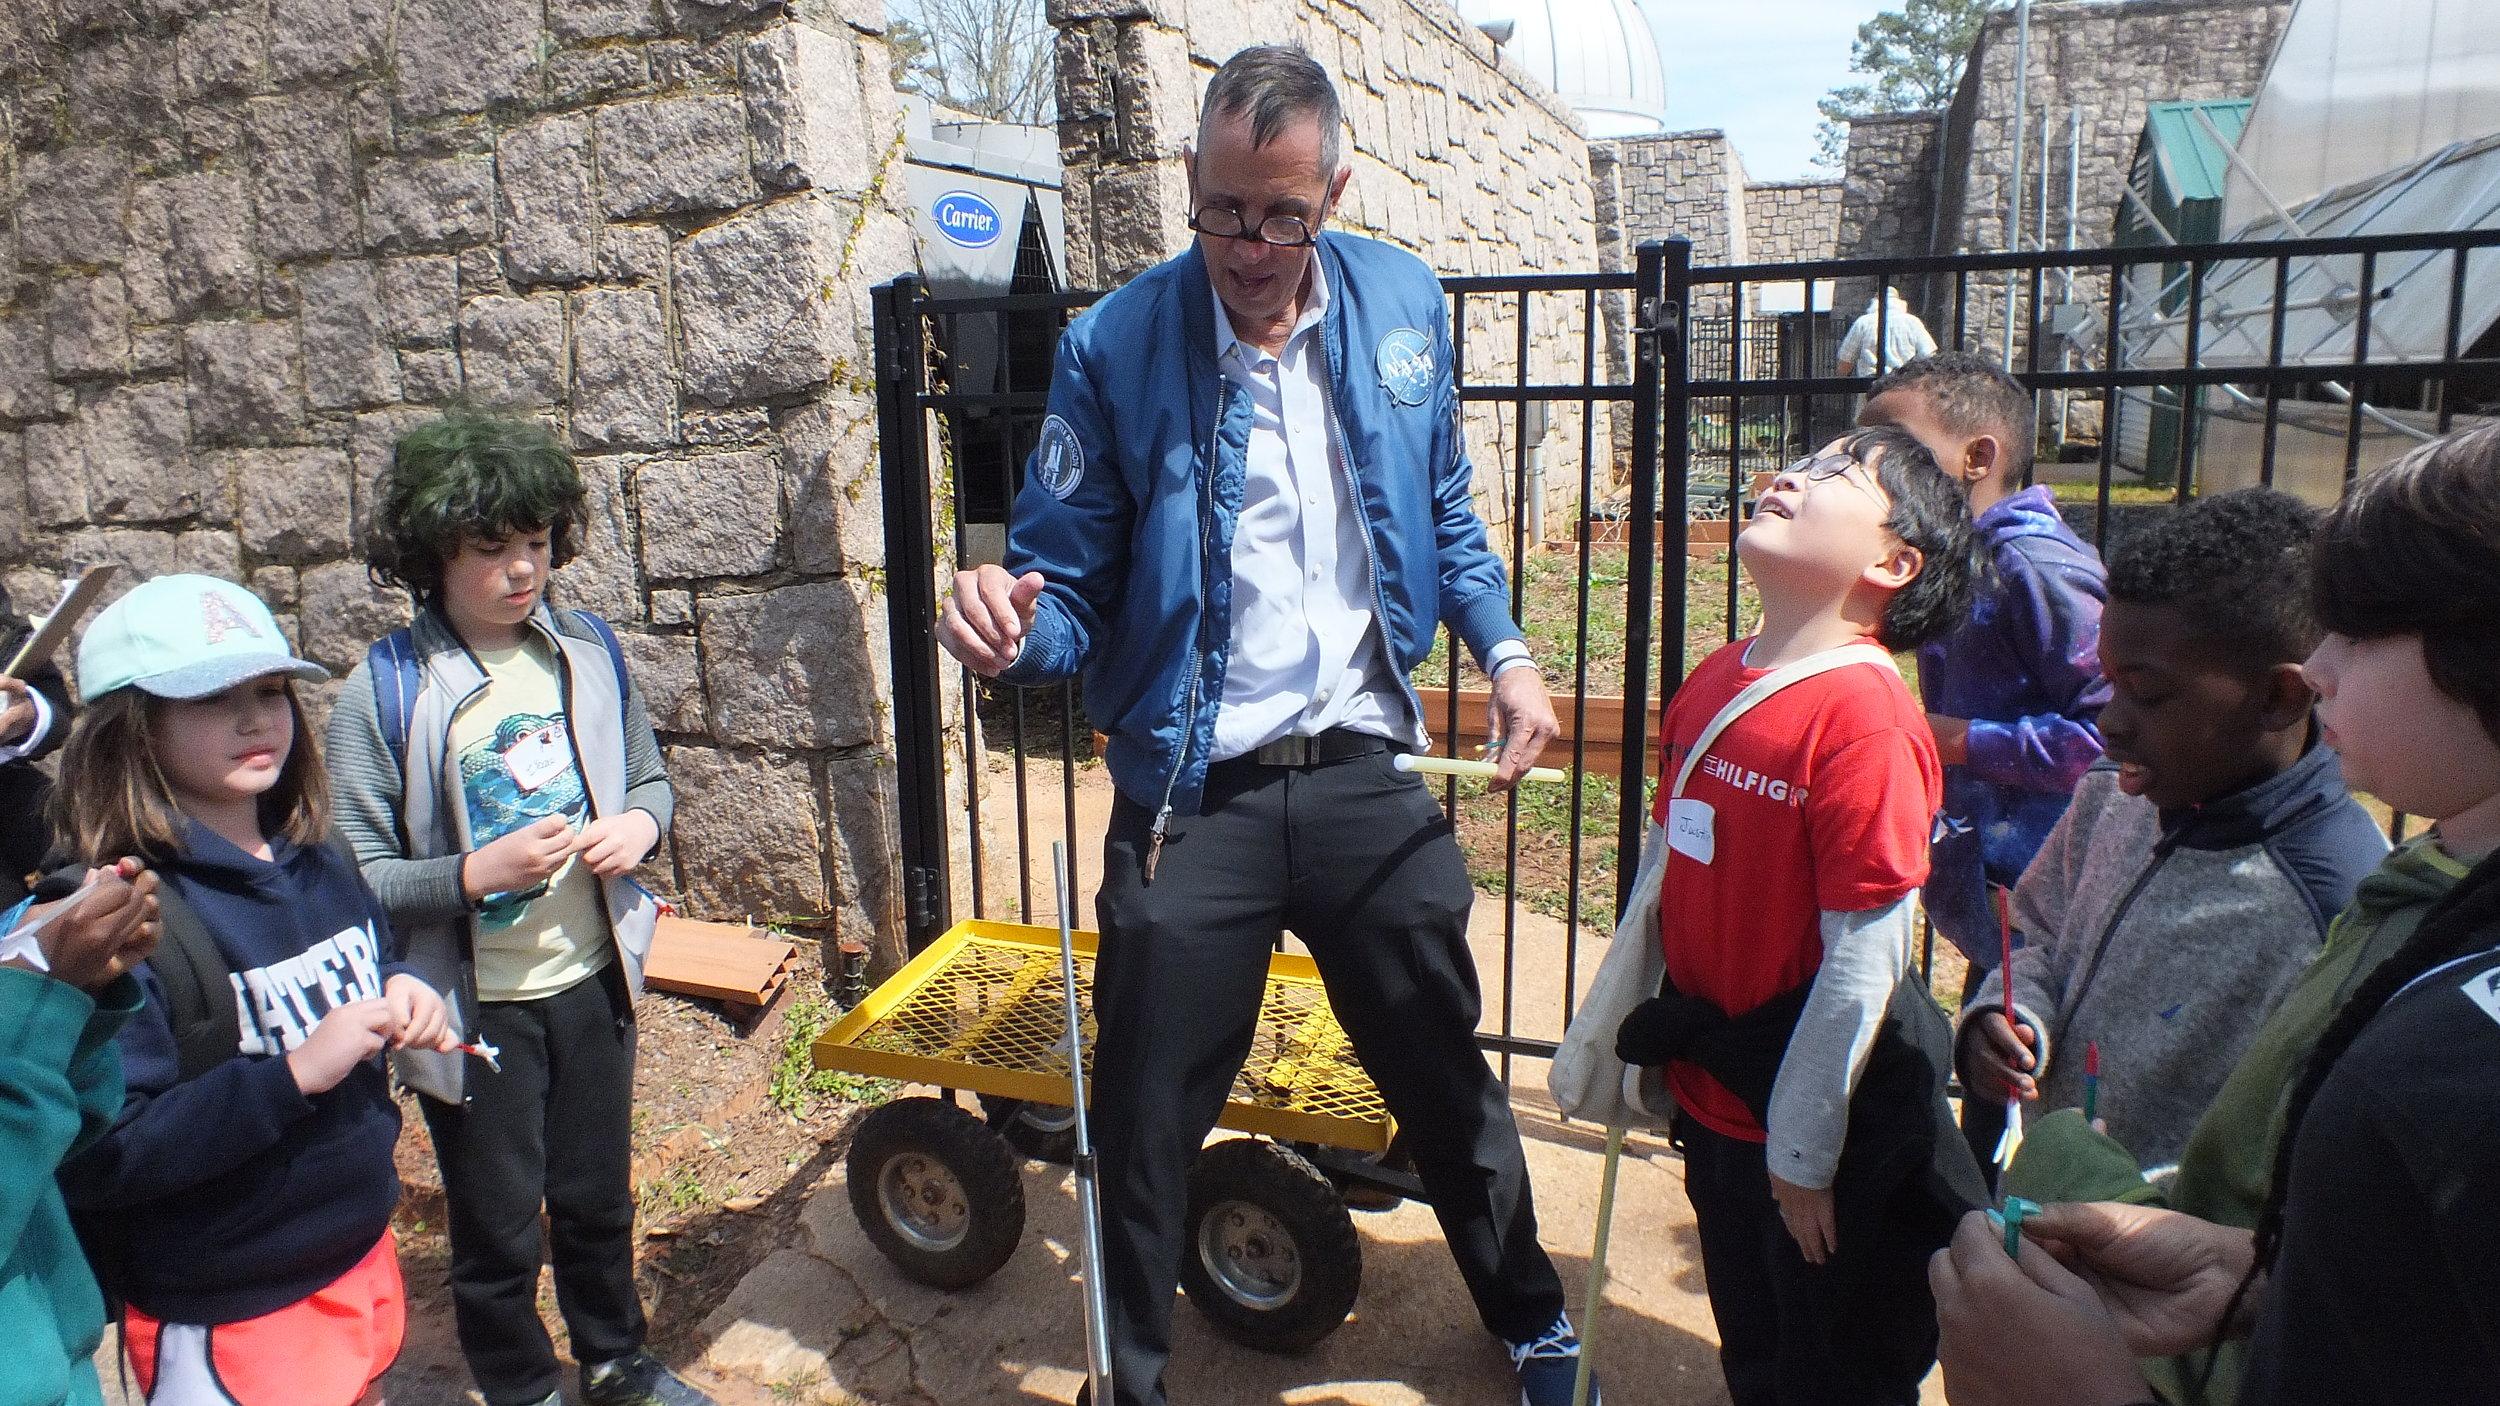 Mike Mongo's Astronaut Job Fair.Atlanta Science Festival 2019.Fernbank Science Center.Pitsco Ed straw rockets.photo Thomas CaleyJPG.JPG